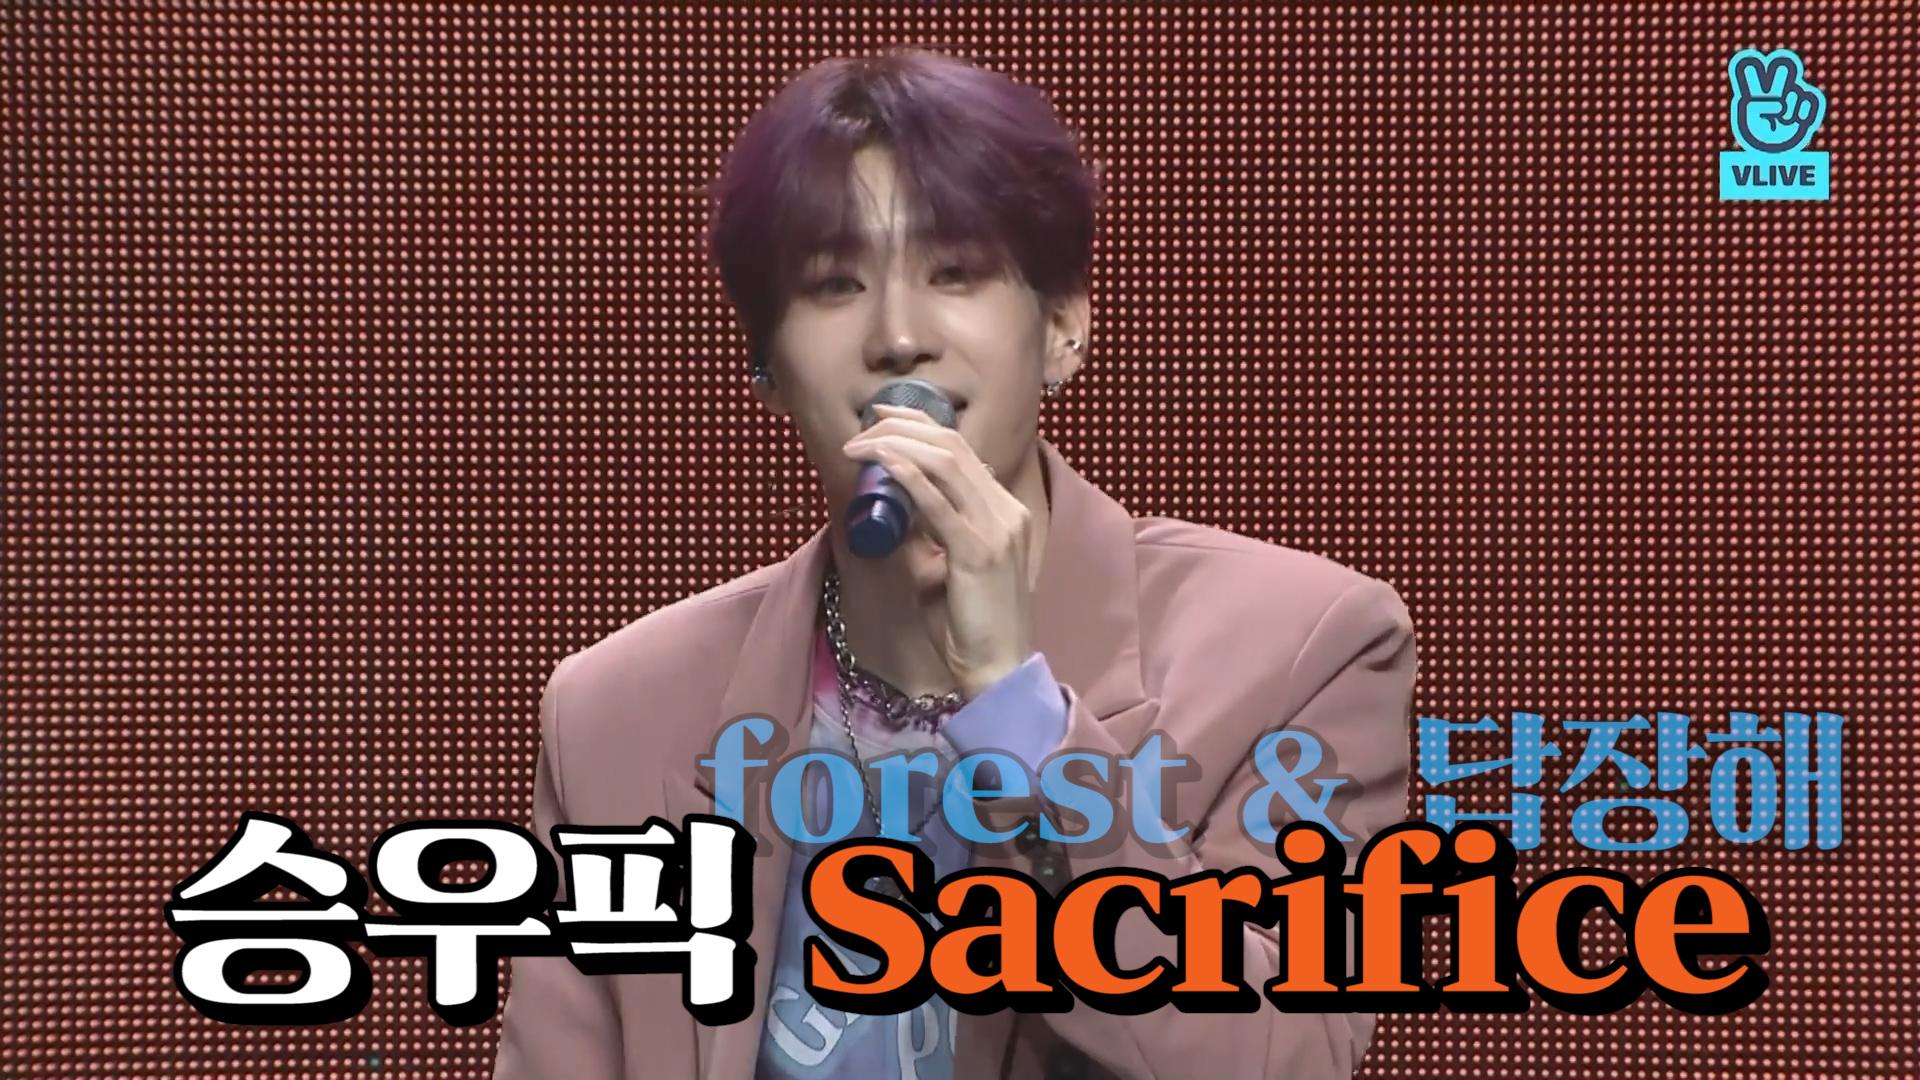 [VICTON] 우야 진짜 승우하다고 백번천번 말해도 모자라❤️ (Seung Woo talking about his first solo album)